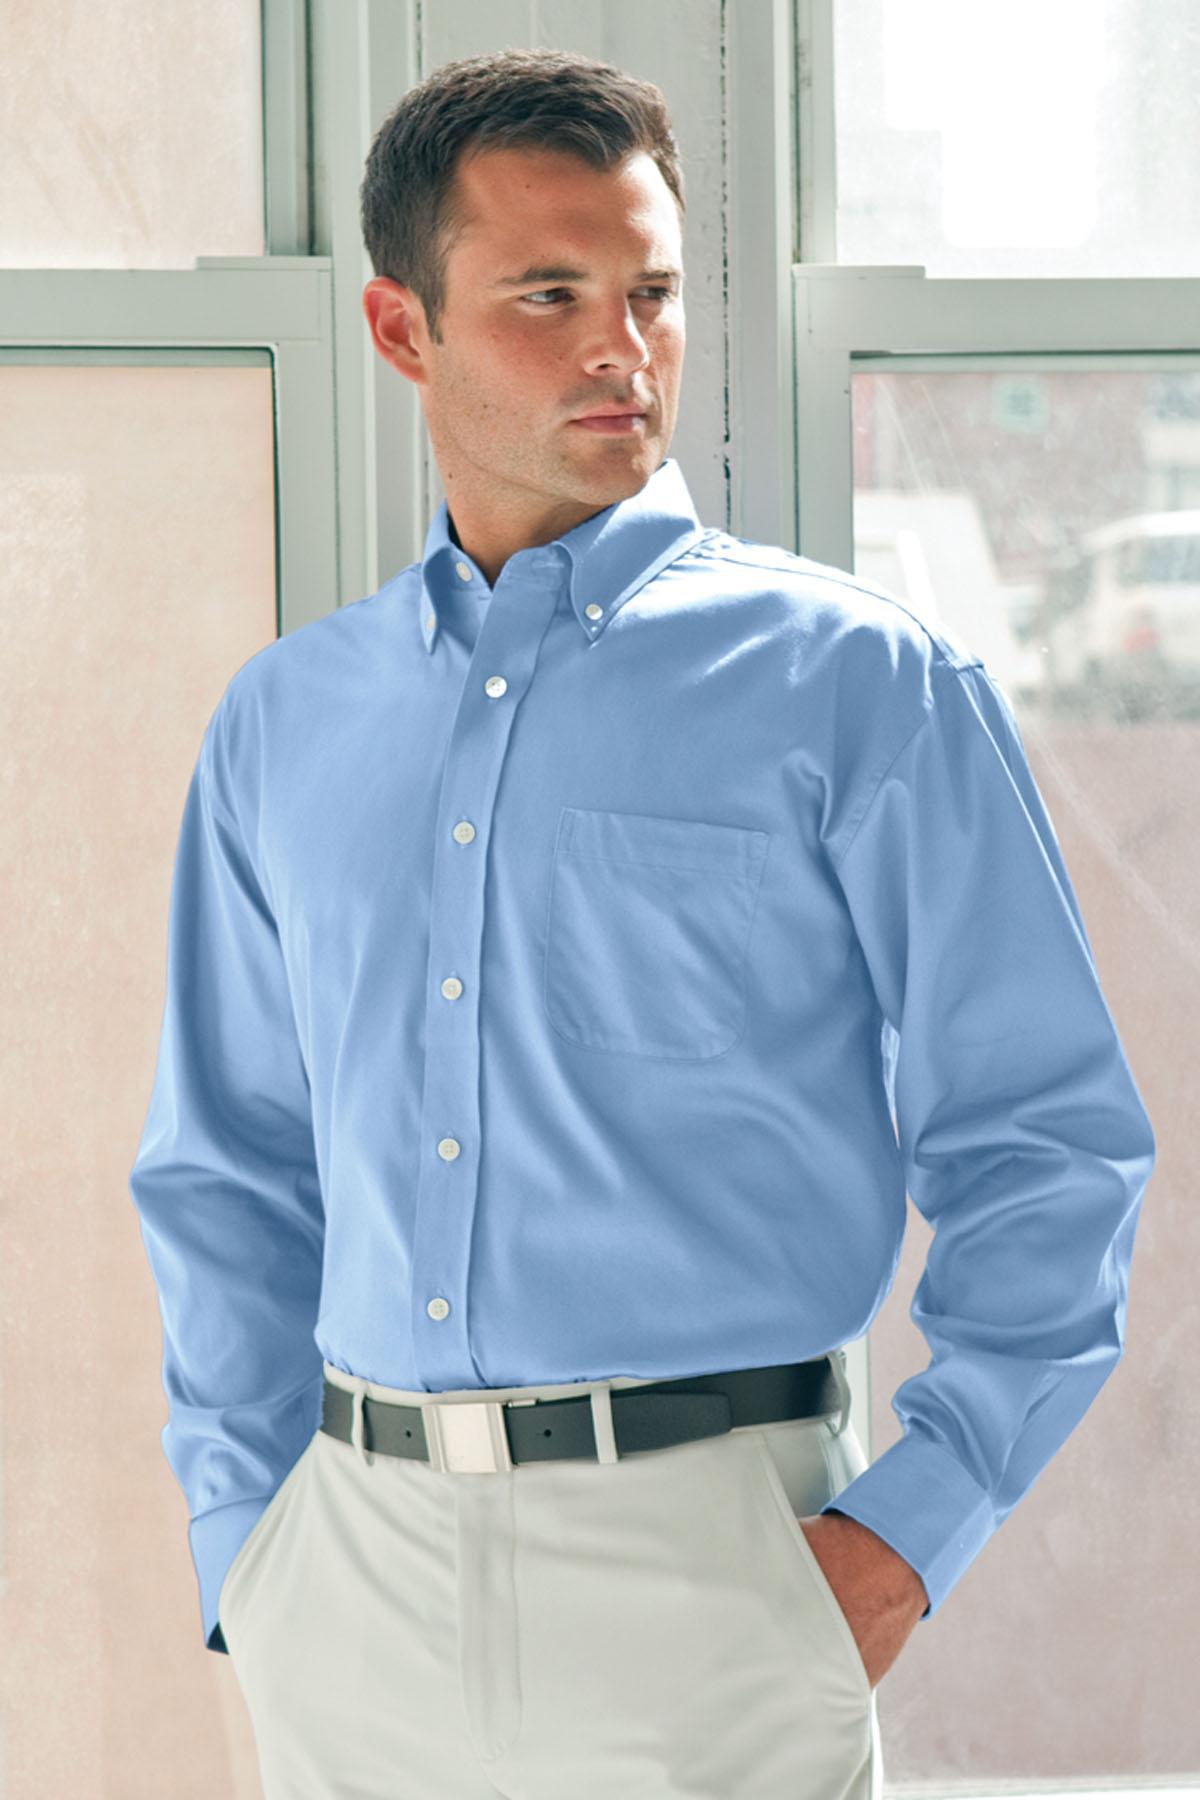 Vantage 1240 - Easy-Care Three Quarter Sleeve Solid Textured Shirt